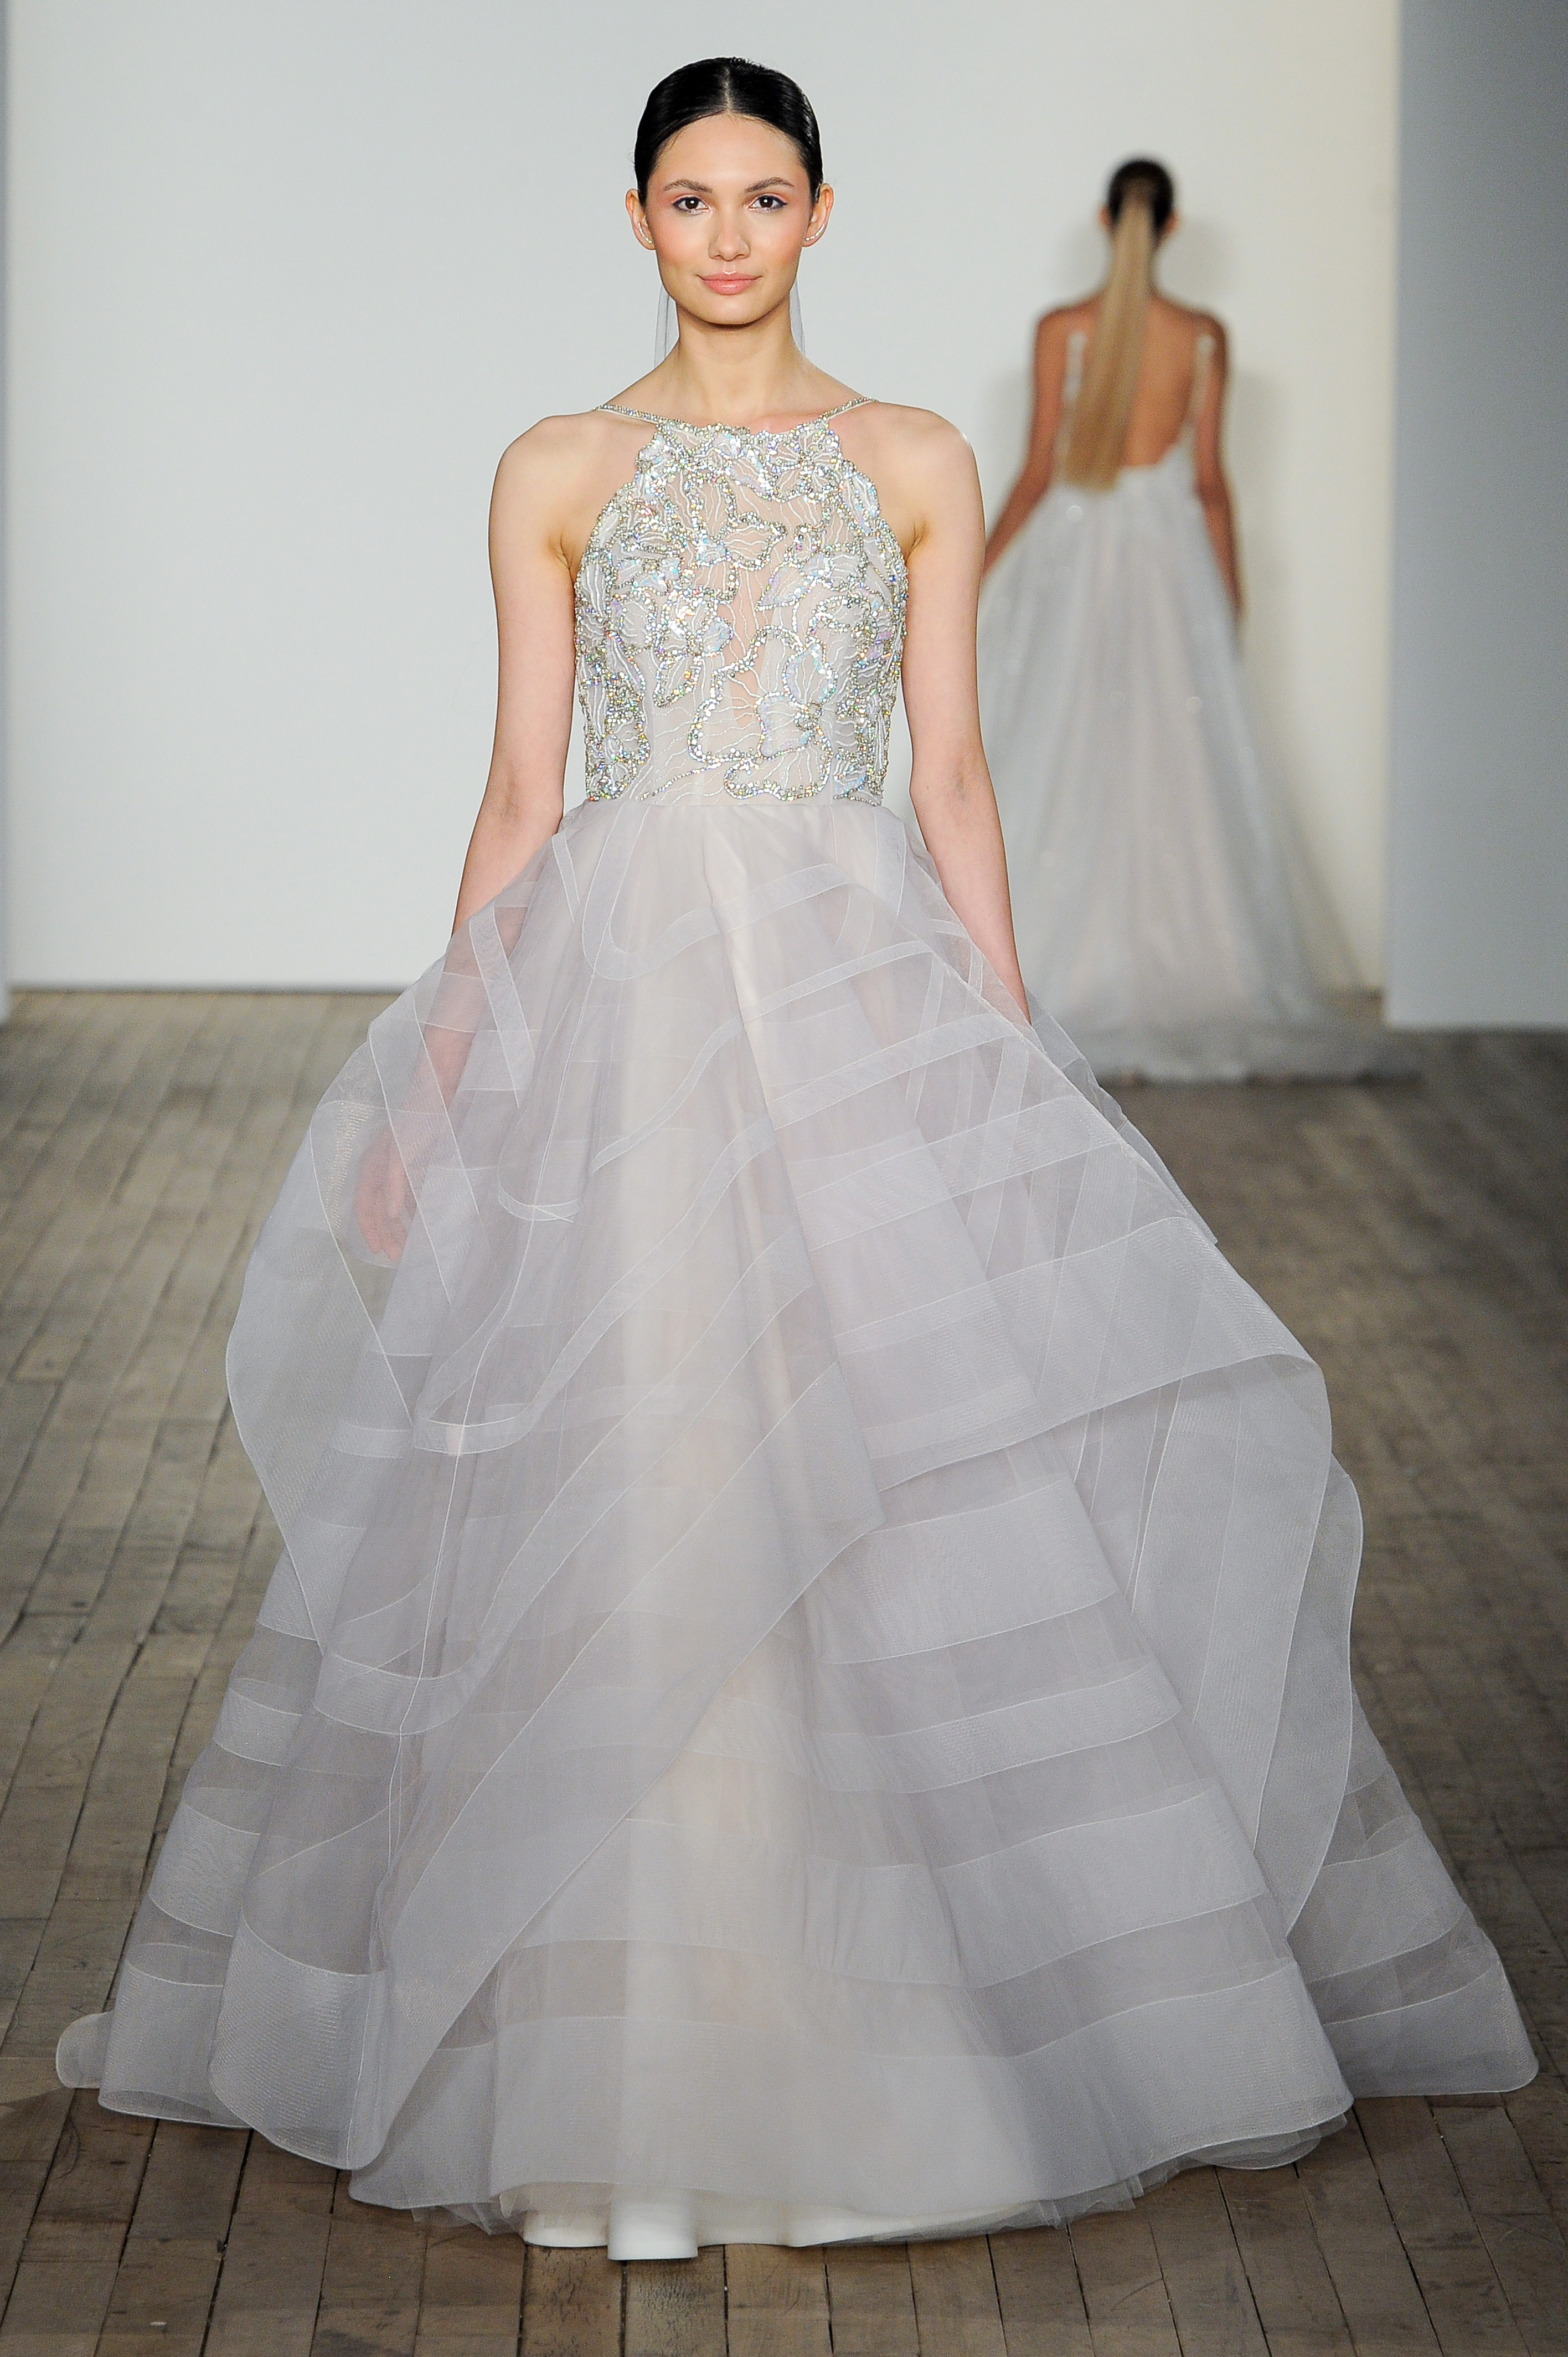 haley paige fall 2019 high neck sheath ball gown wedding dress